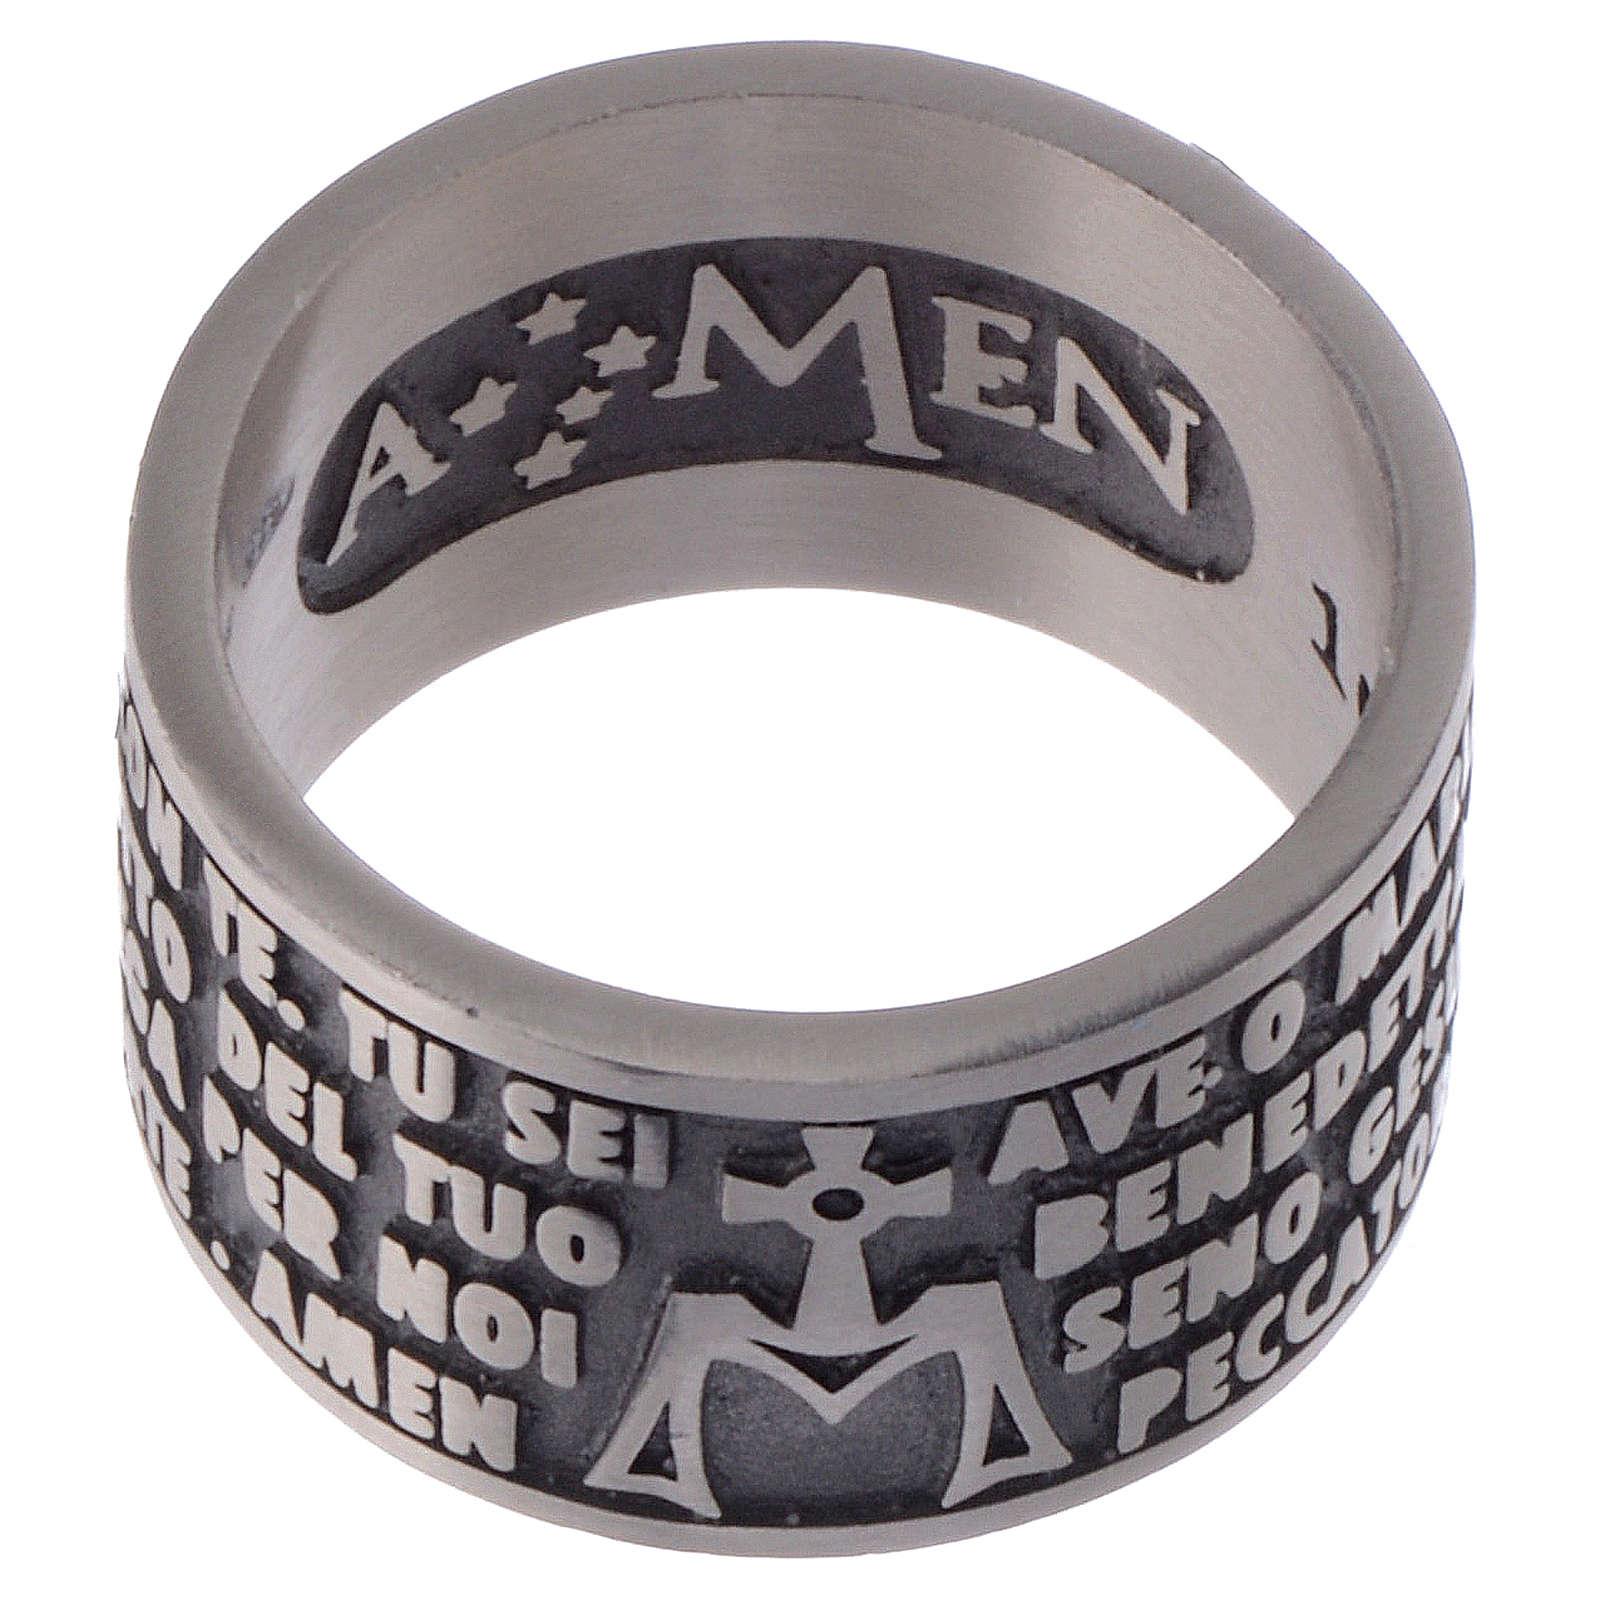 Pierścień Amen odciśnięte Ave Maria srebro 925 3